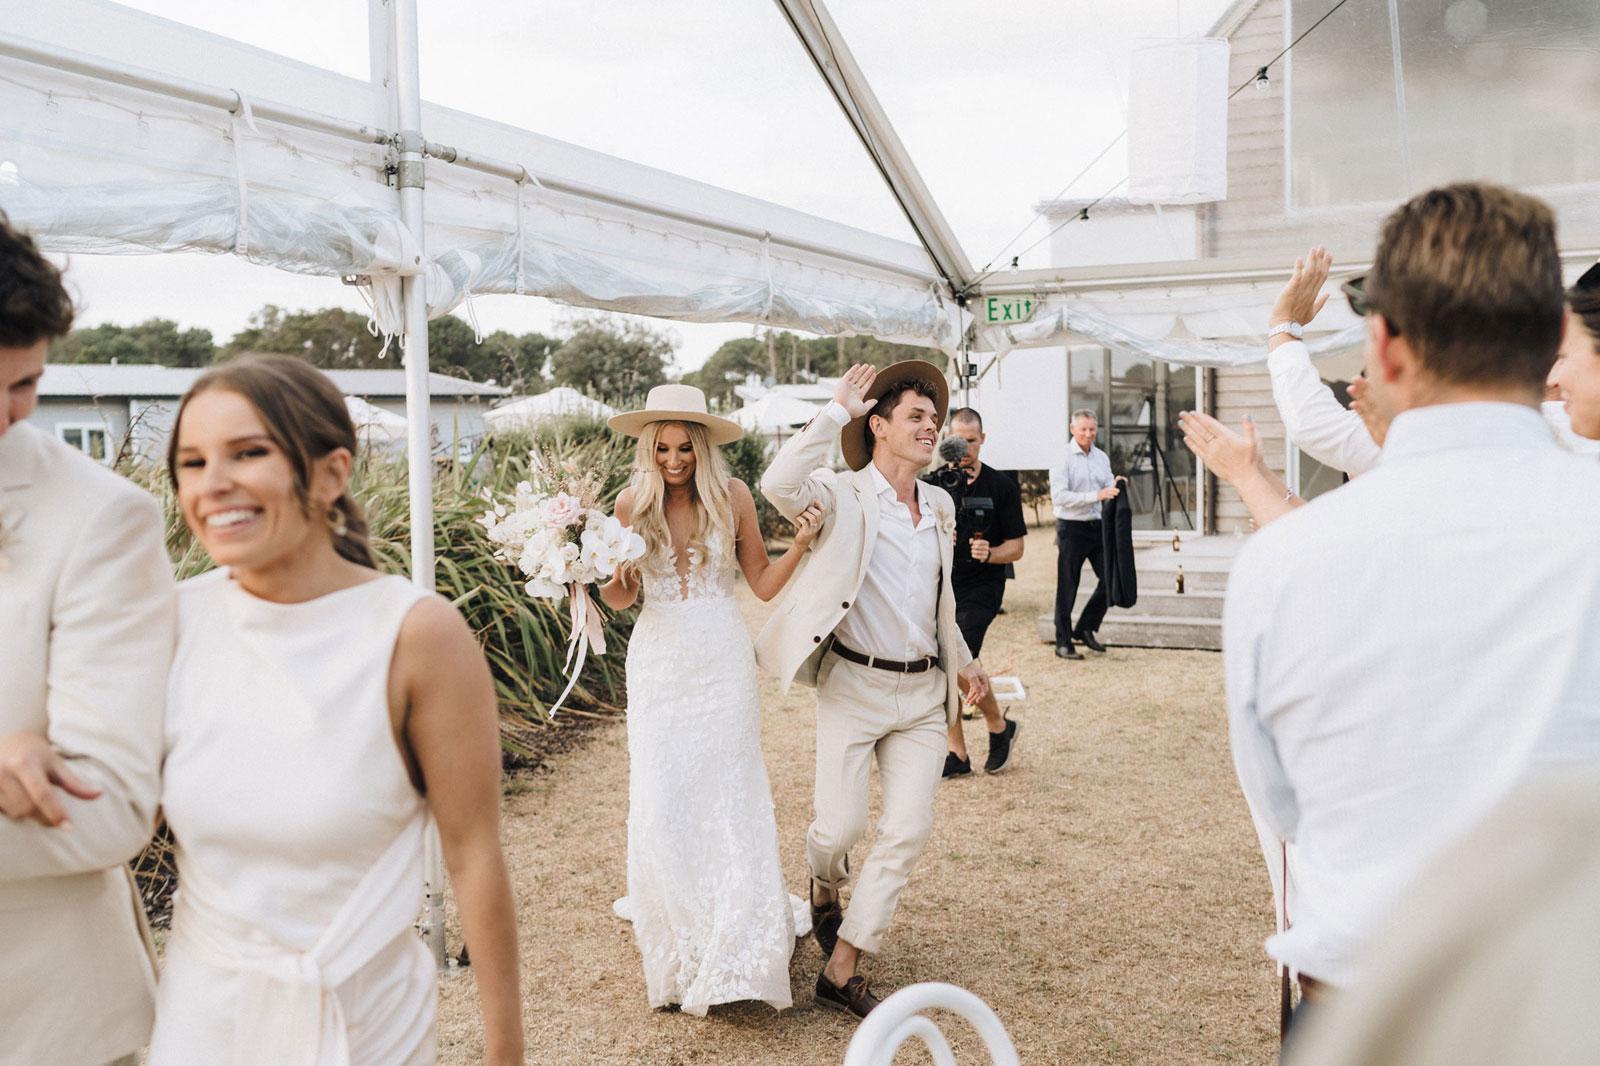 newfound-k-b-coromandel-wedding-photographers-101